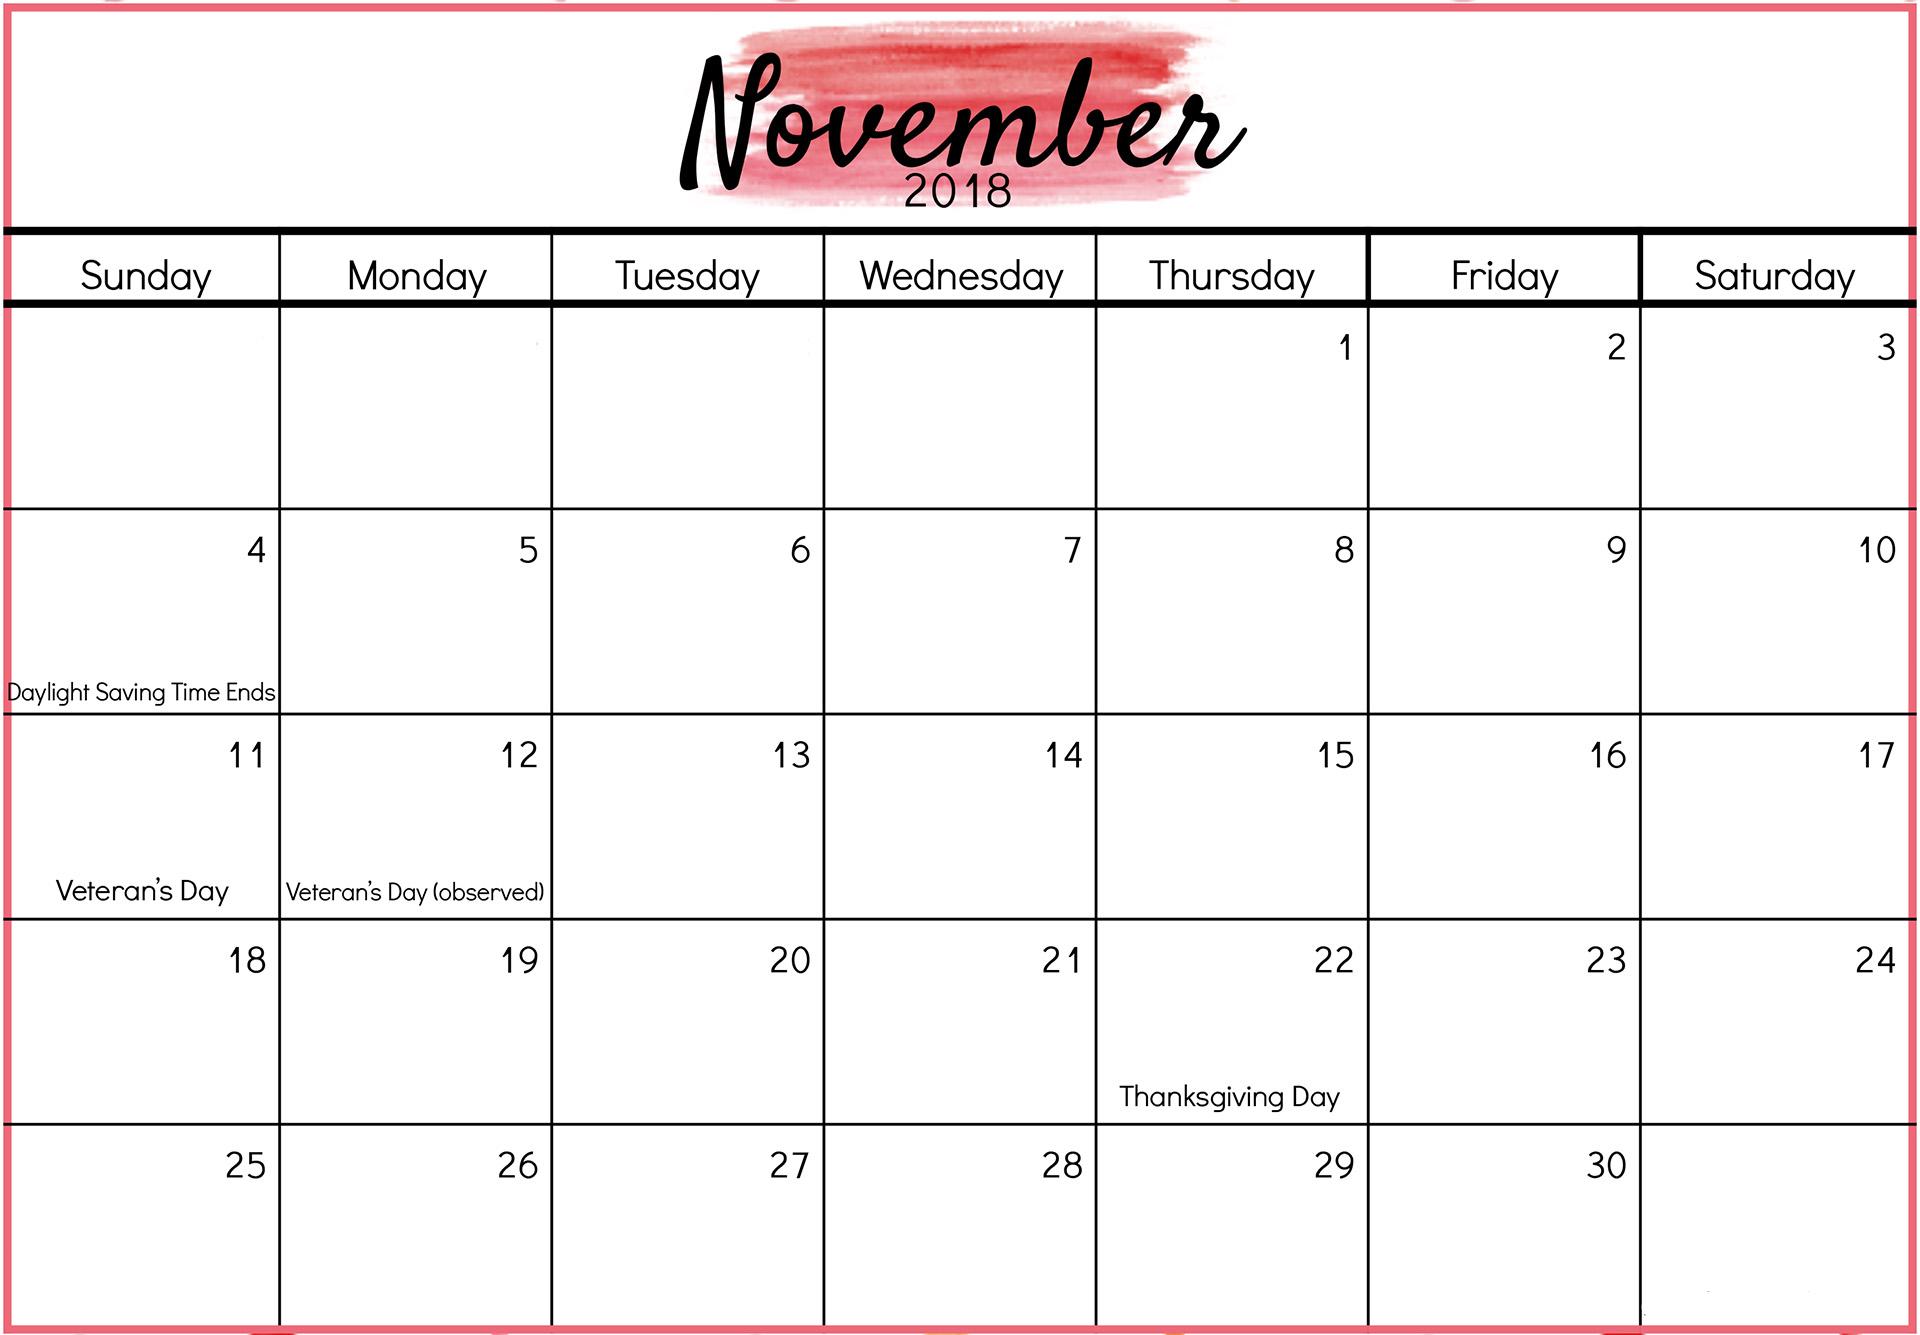 November 2018 Calendar Template pertaining to Holidays Calendar Templates November